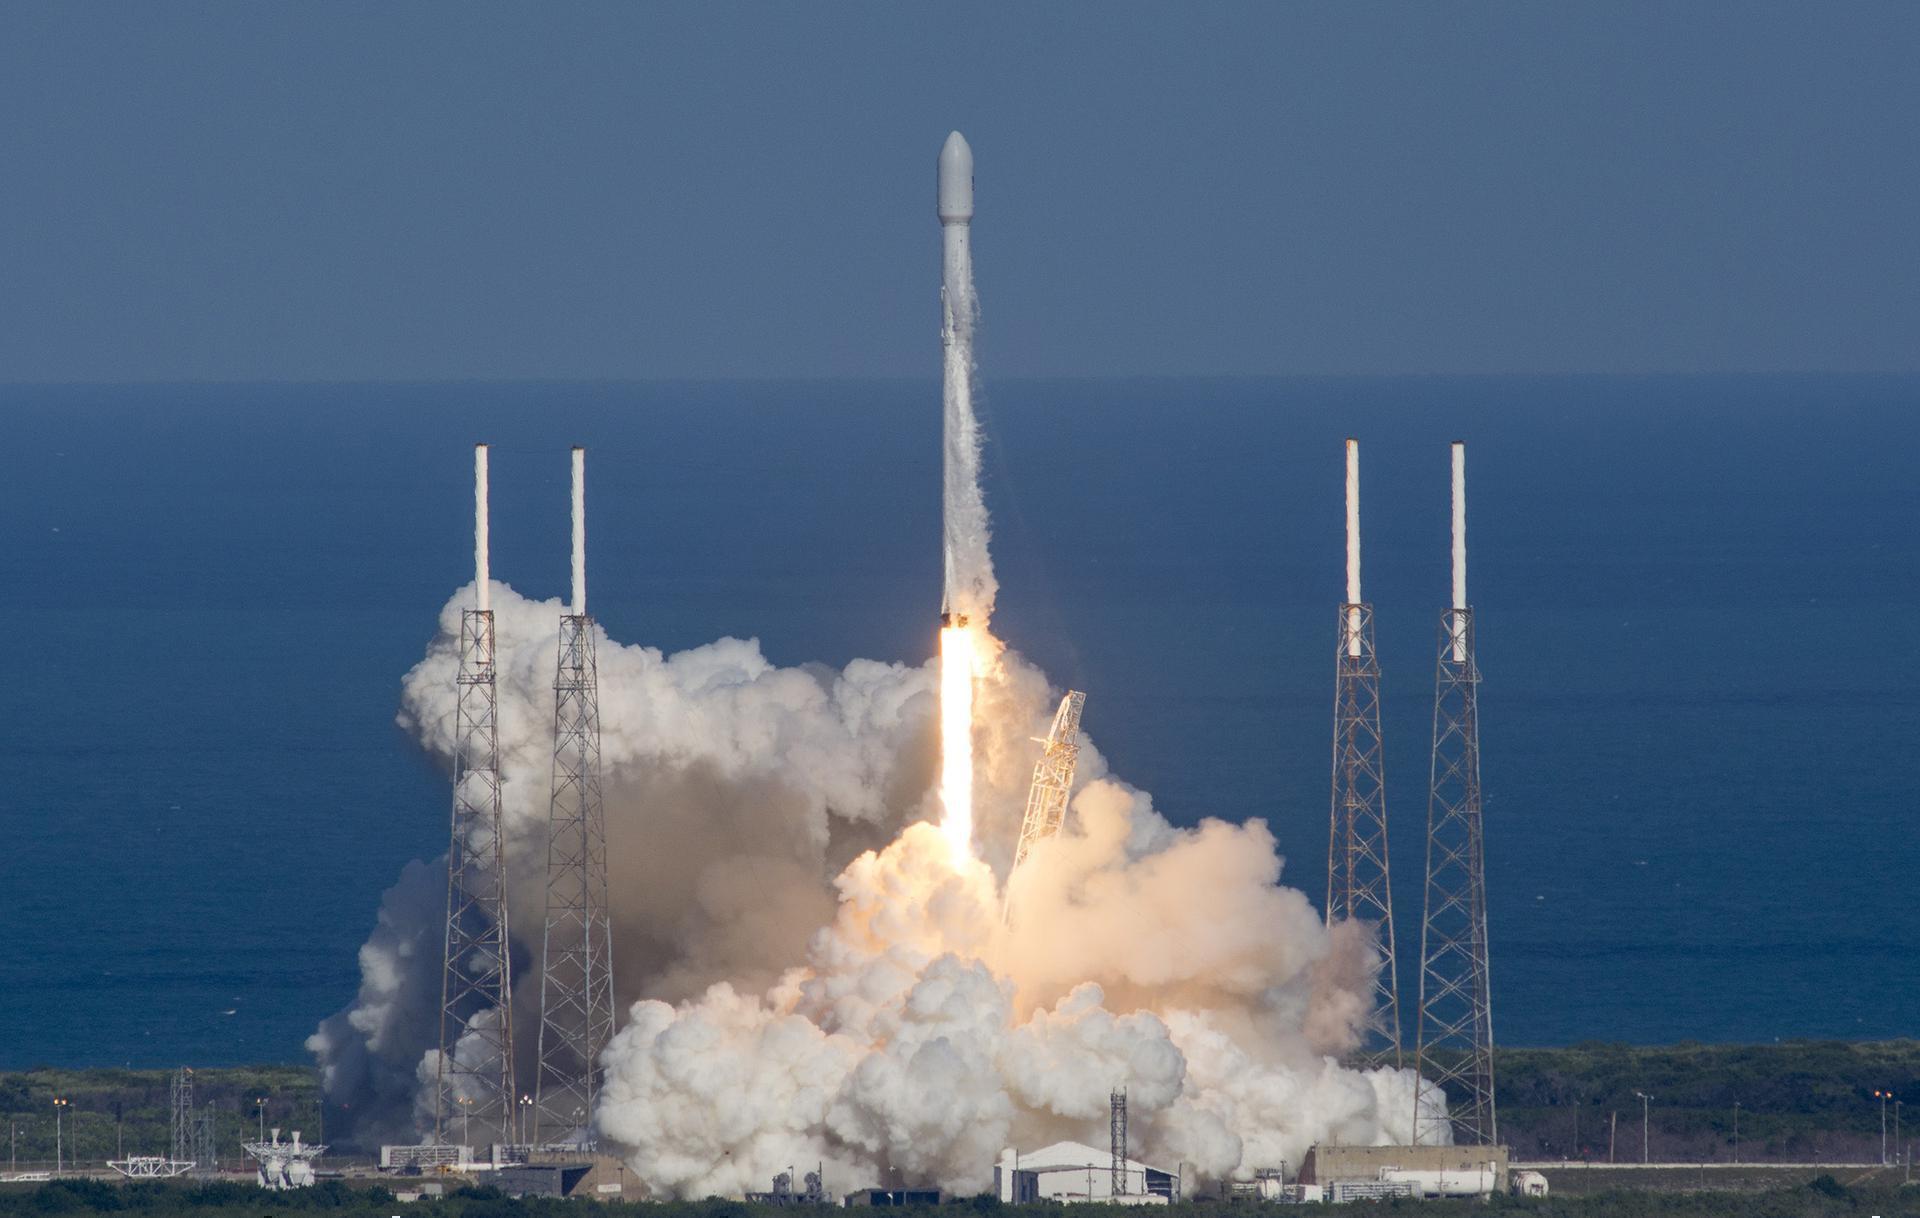 Falcon 9 Full Thrust | Amos 6 (Failure before launch)